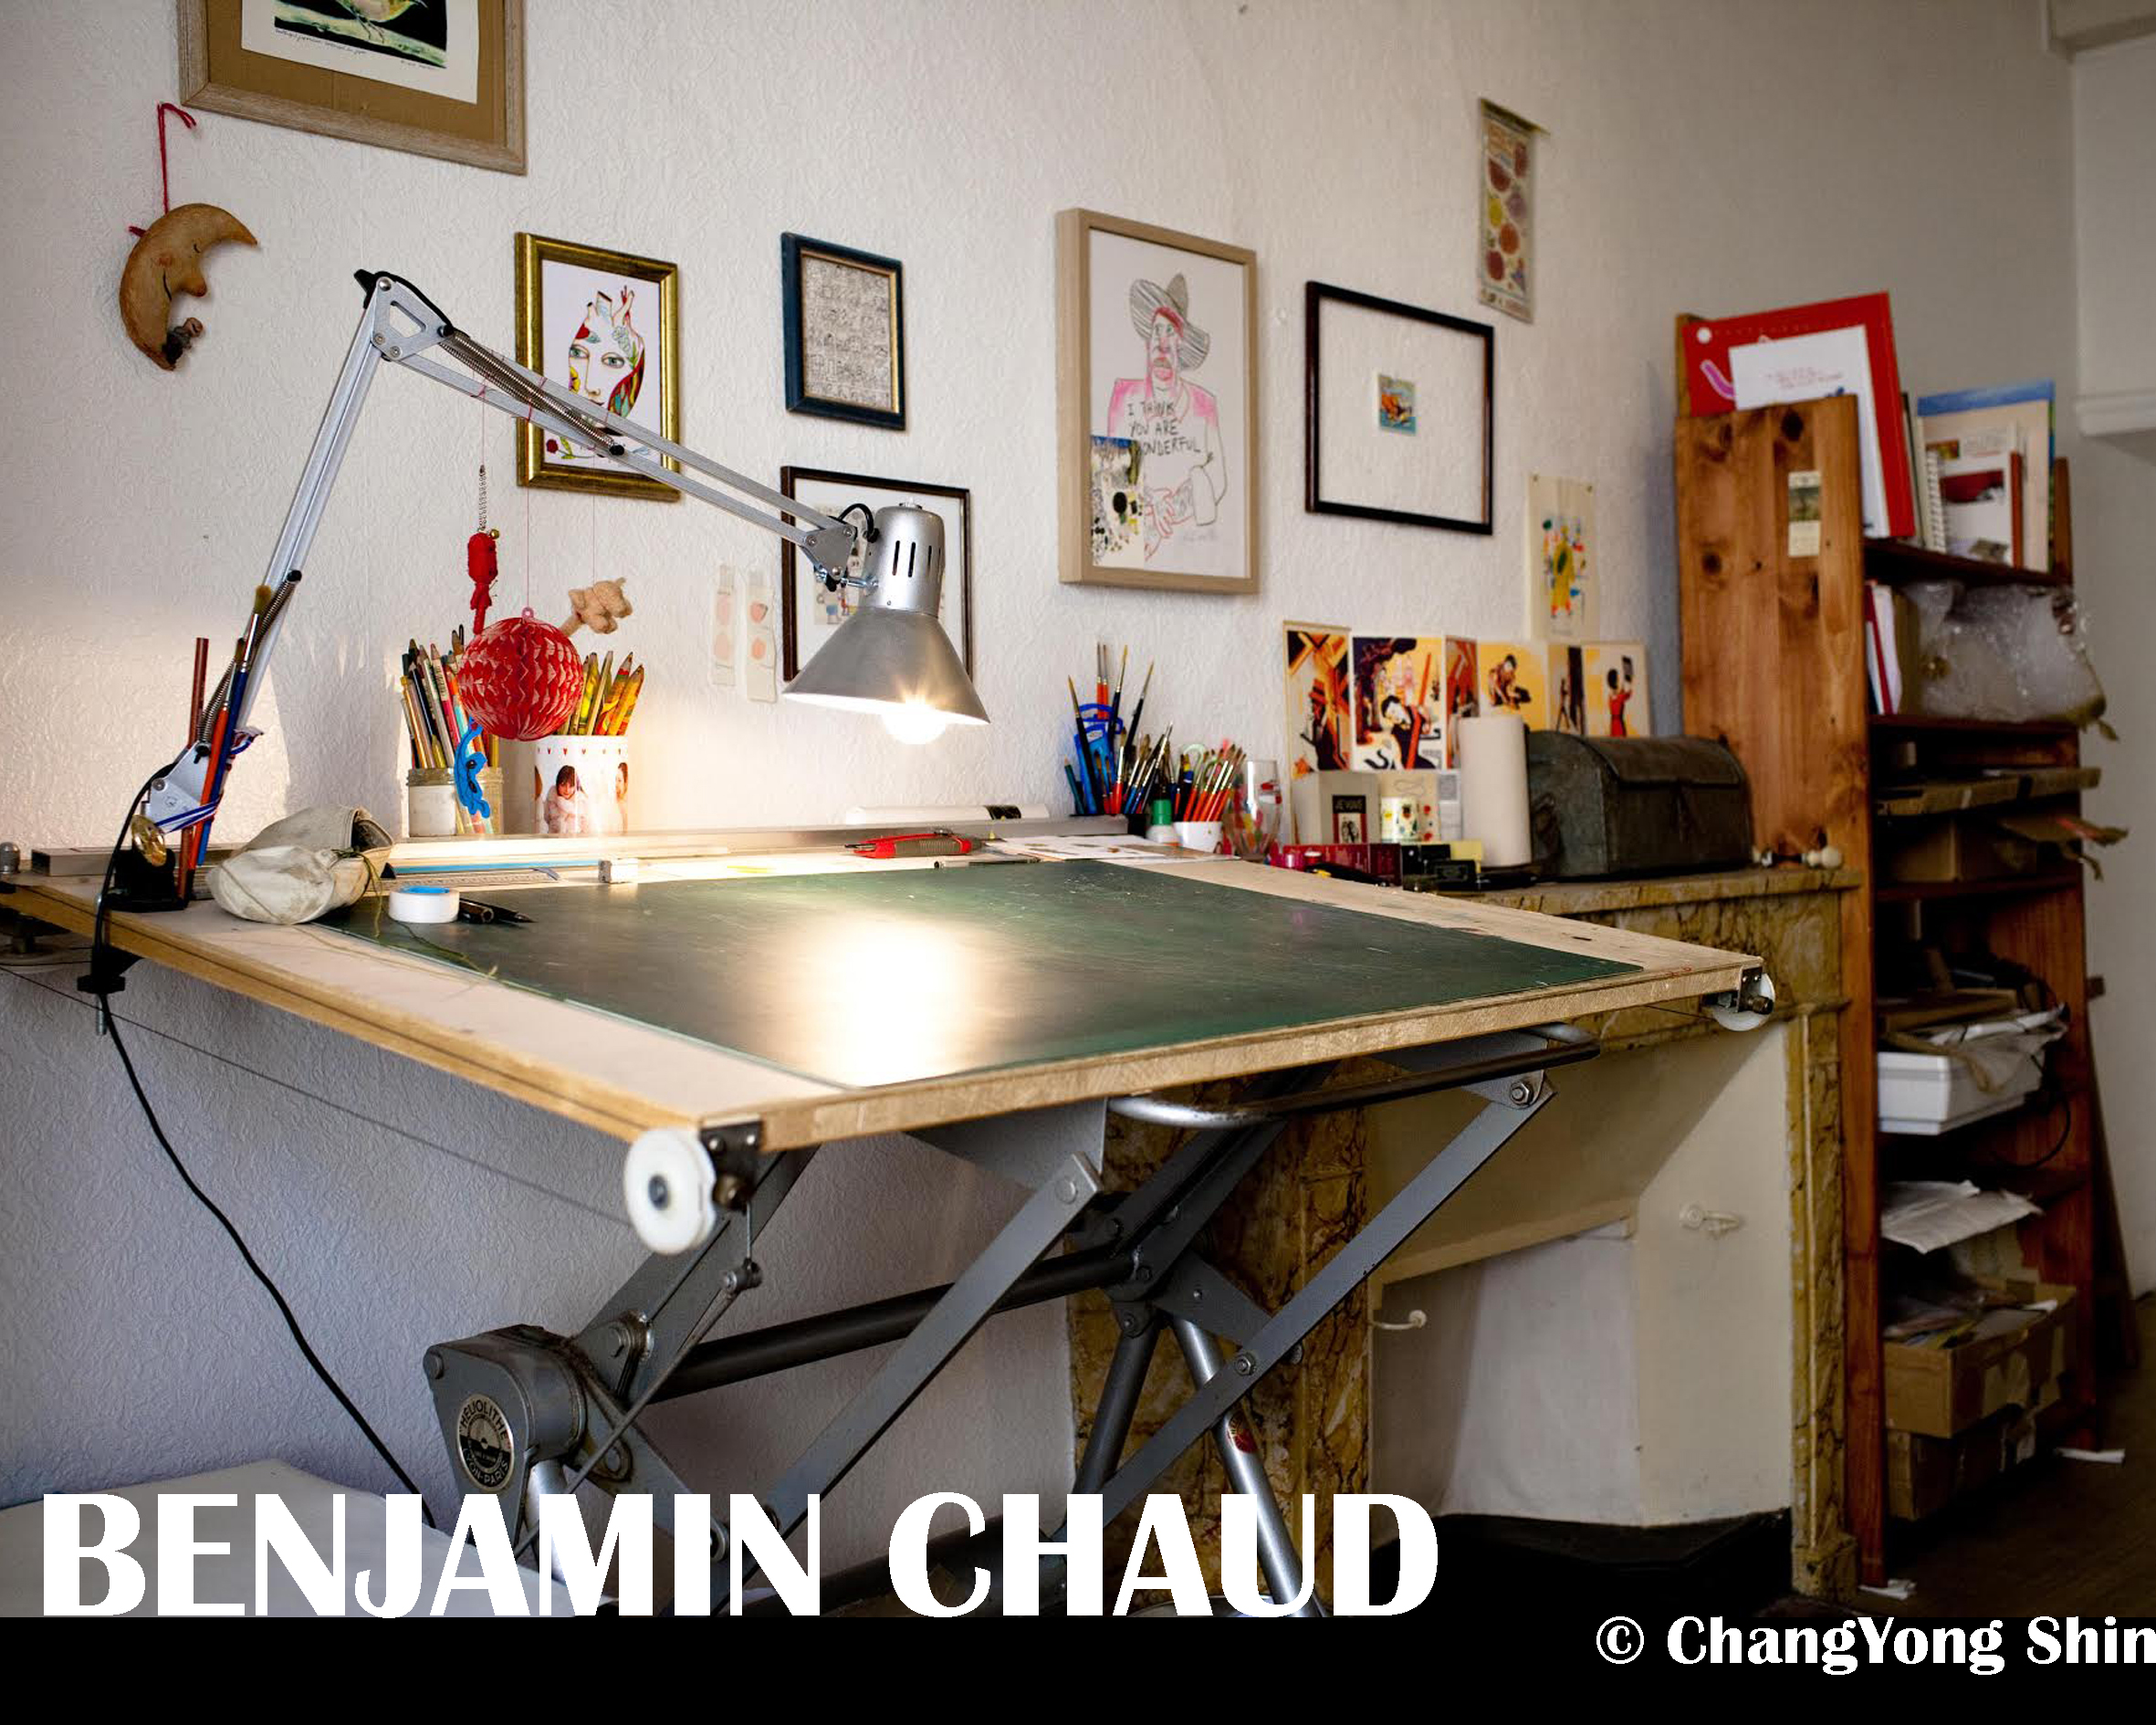 Benjamin Chaud